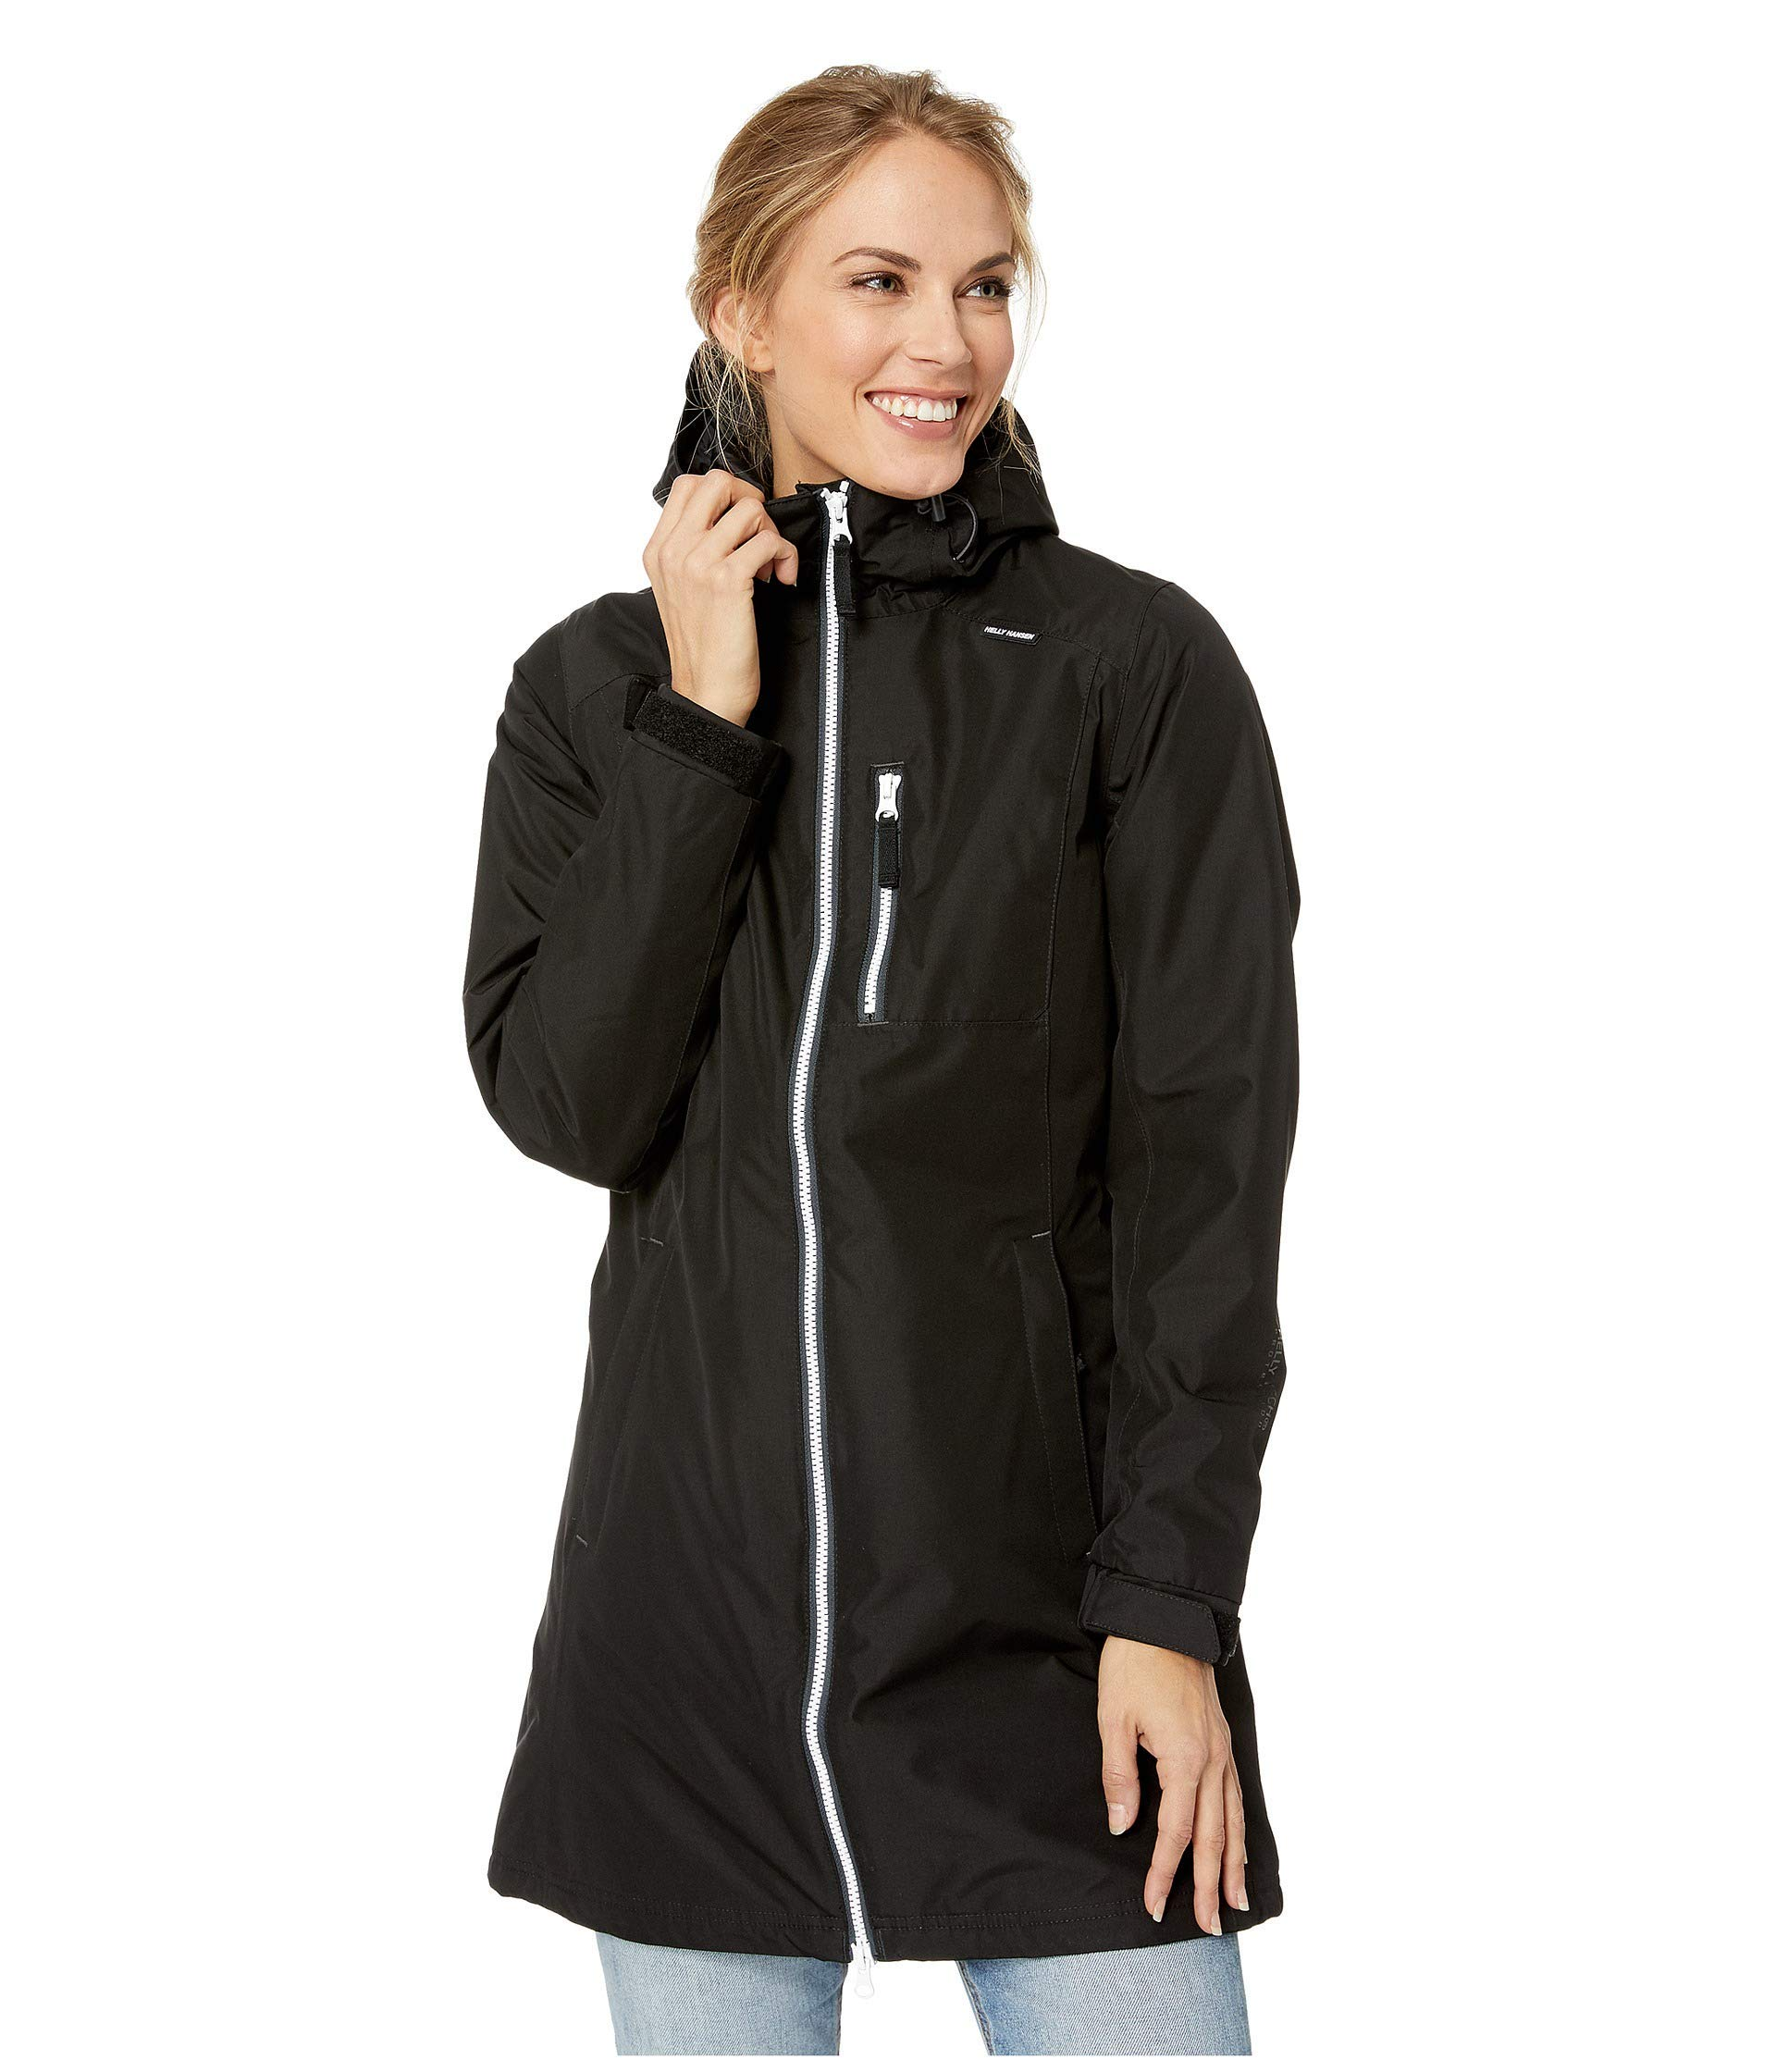 Helly Hansen Women's Long Belfast Insulated Waterproof Windproof Breathable Raincoat Jacket with Hood, 991 Black, Large by Helly Hansen